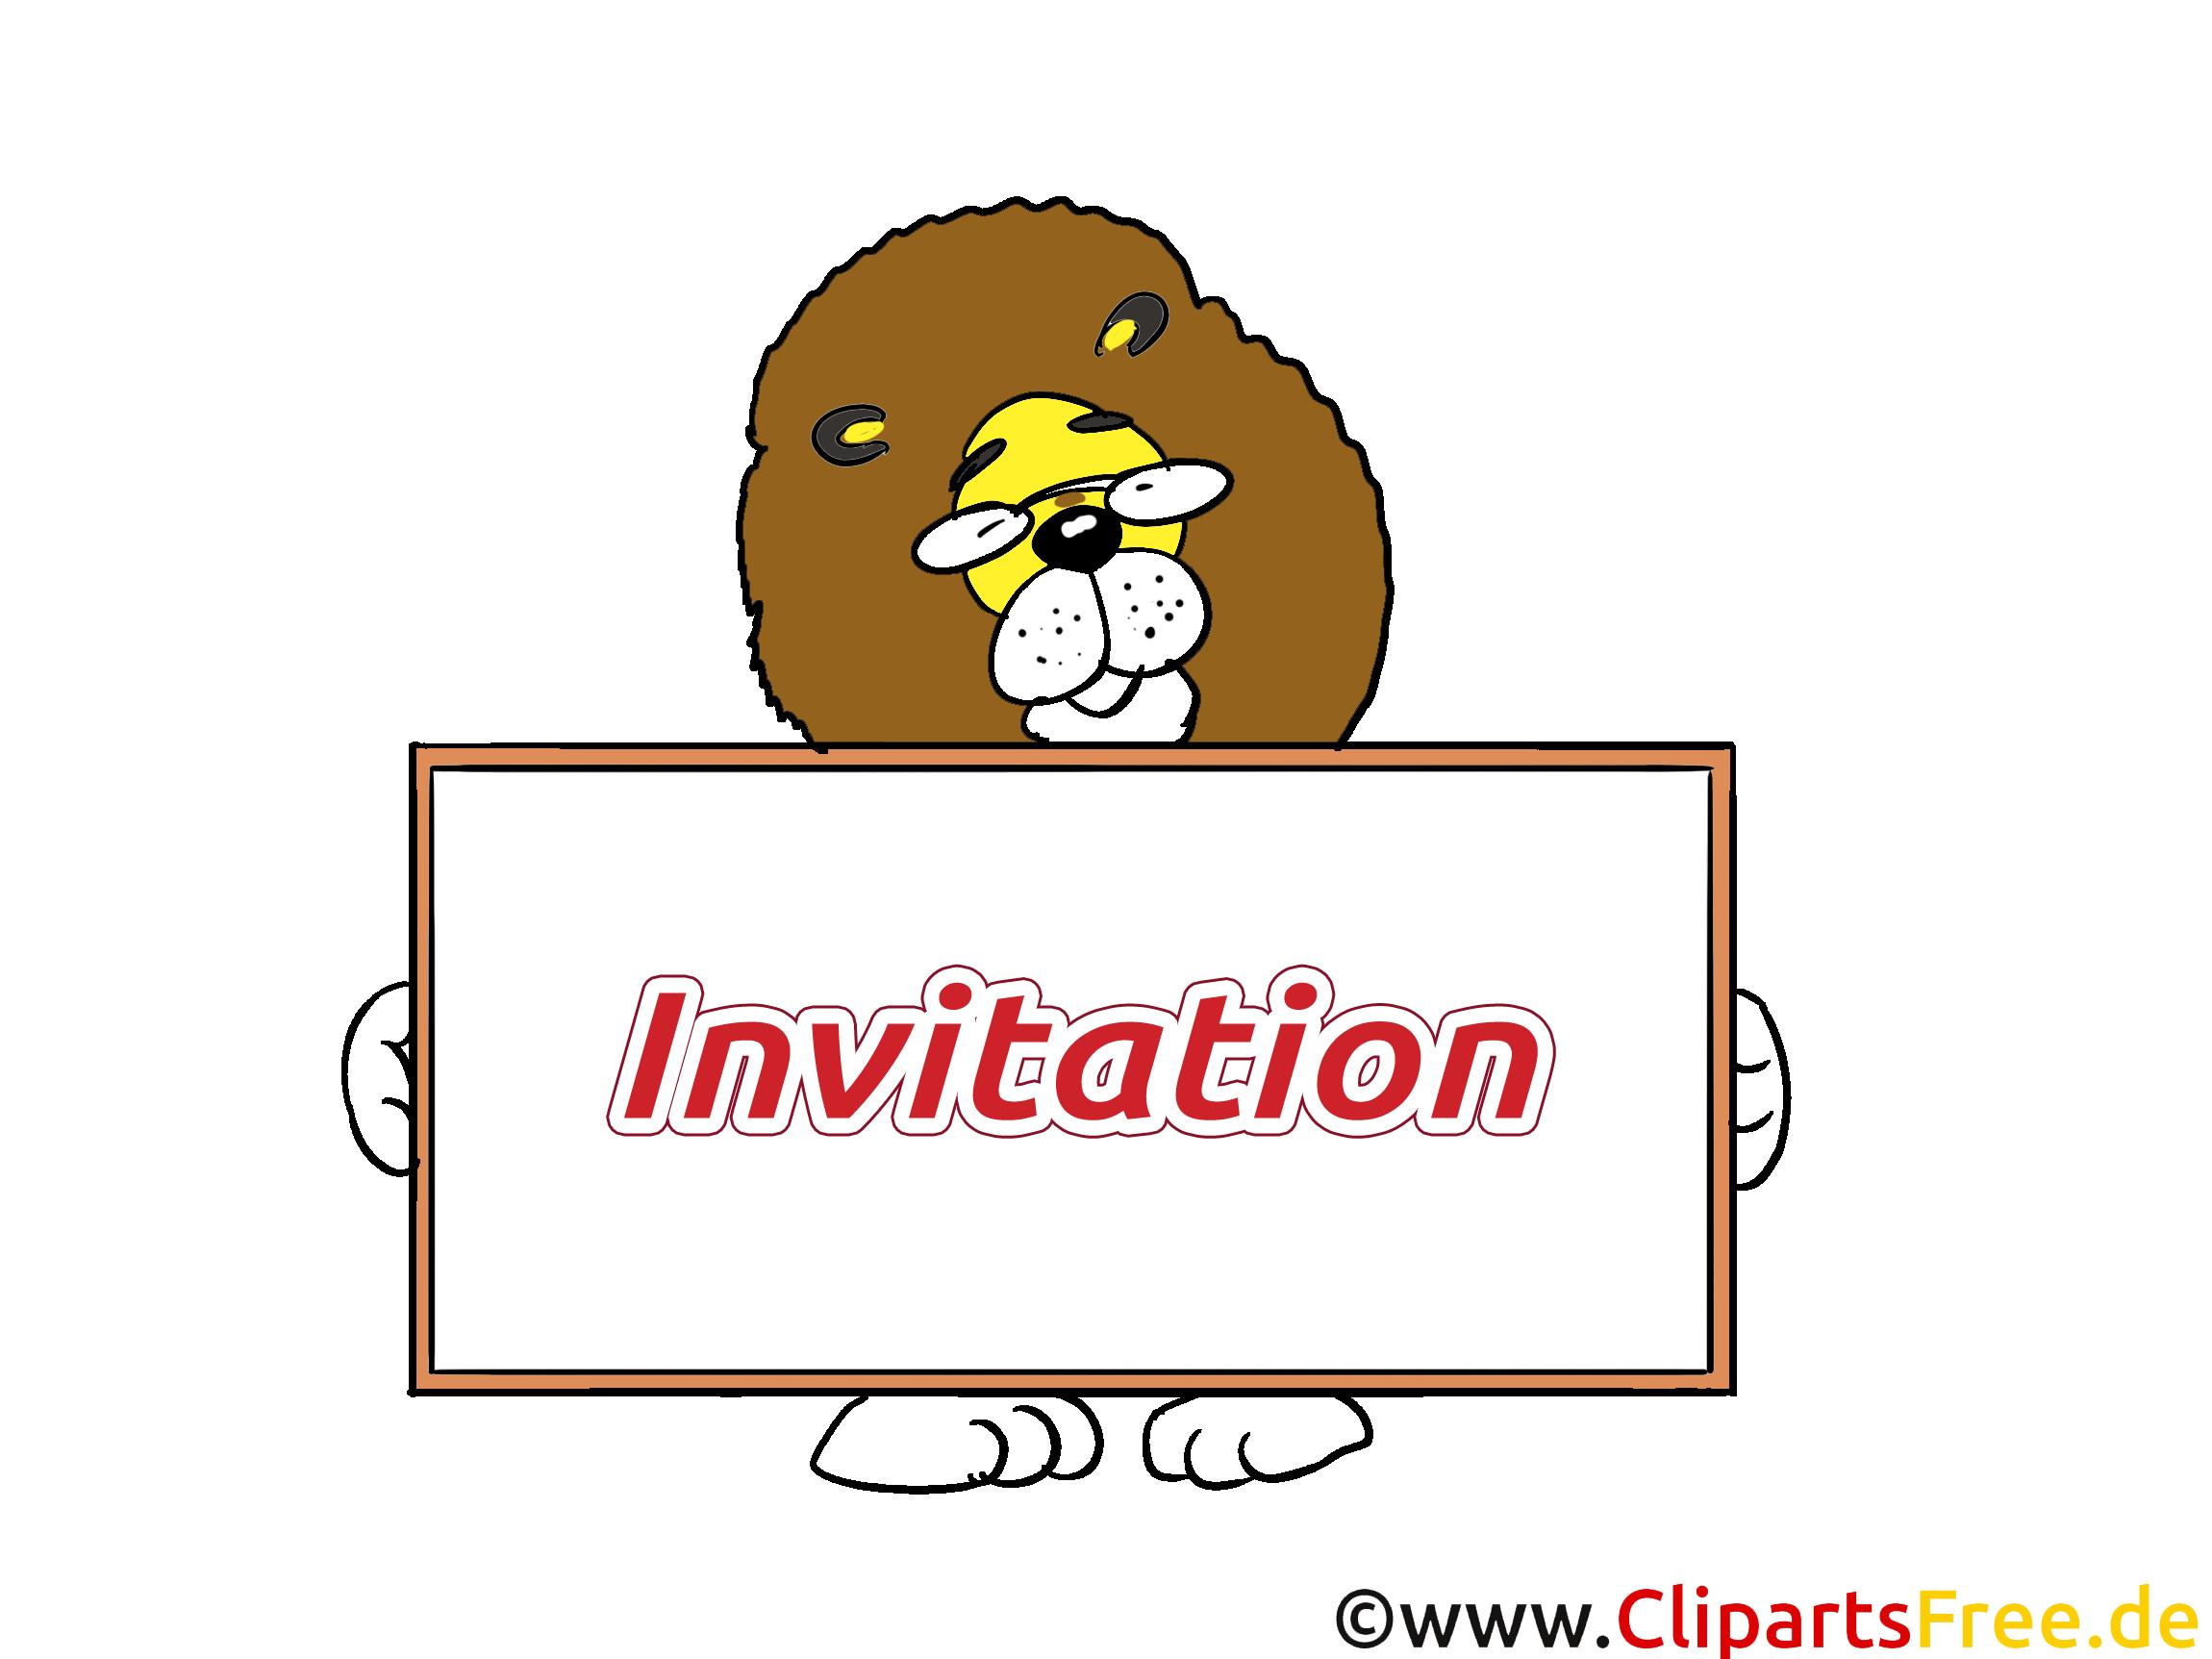 Lion illustration gratuite - Invitation clipart